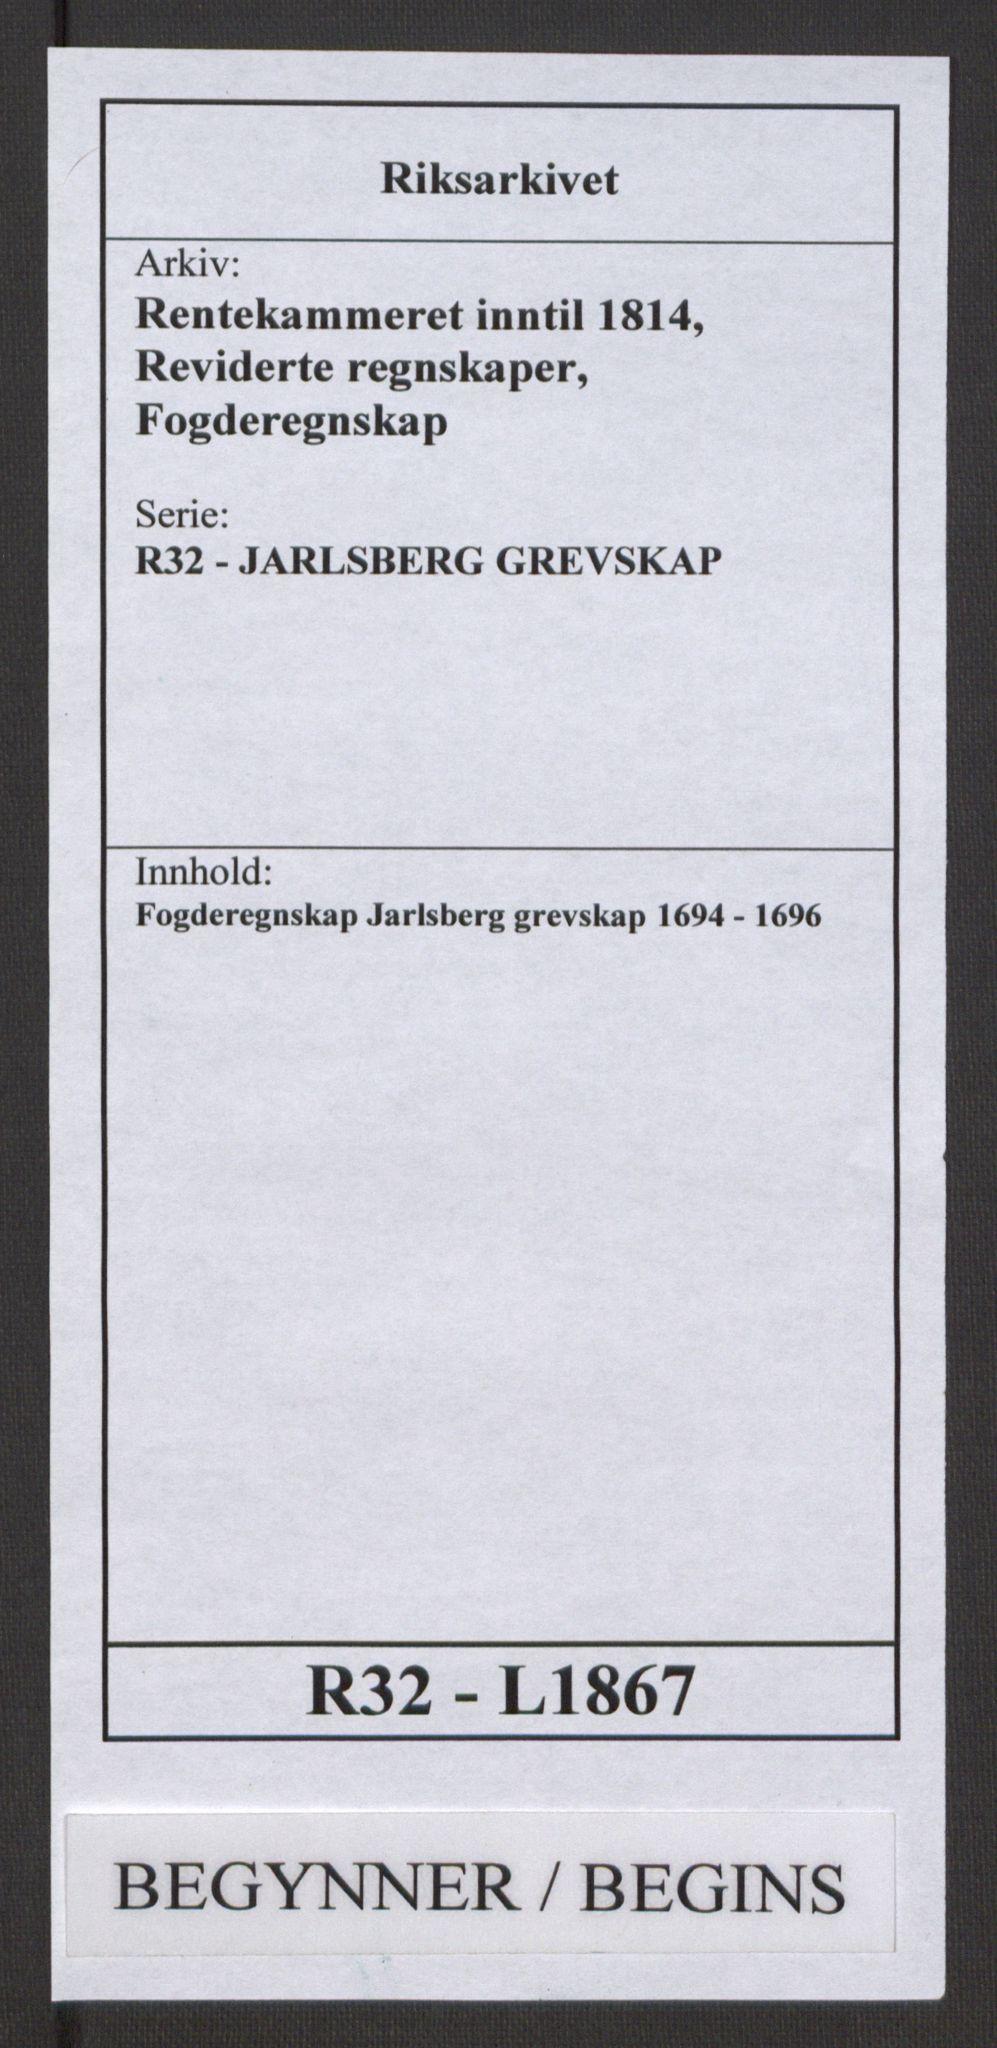 RA, Rentekammeret inntil 1814, Reviderte regnskaper, Fogderegnskap, R32/L1867: Fogderegnskap Jarlsberg grevskap, 1694-1696, s. 1